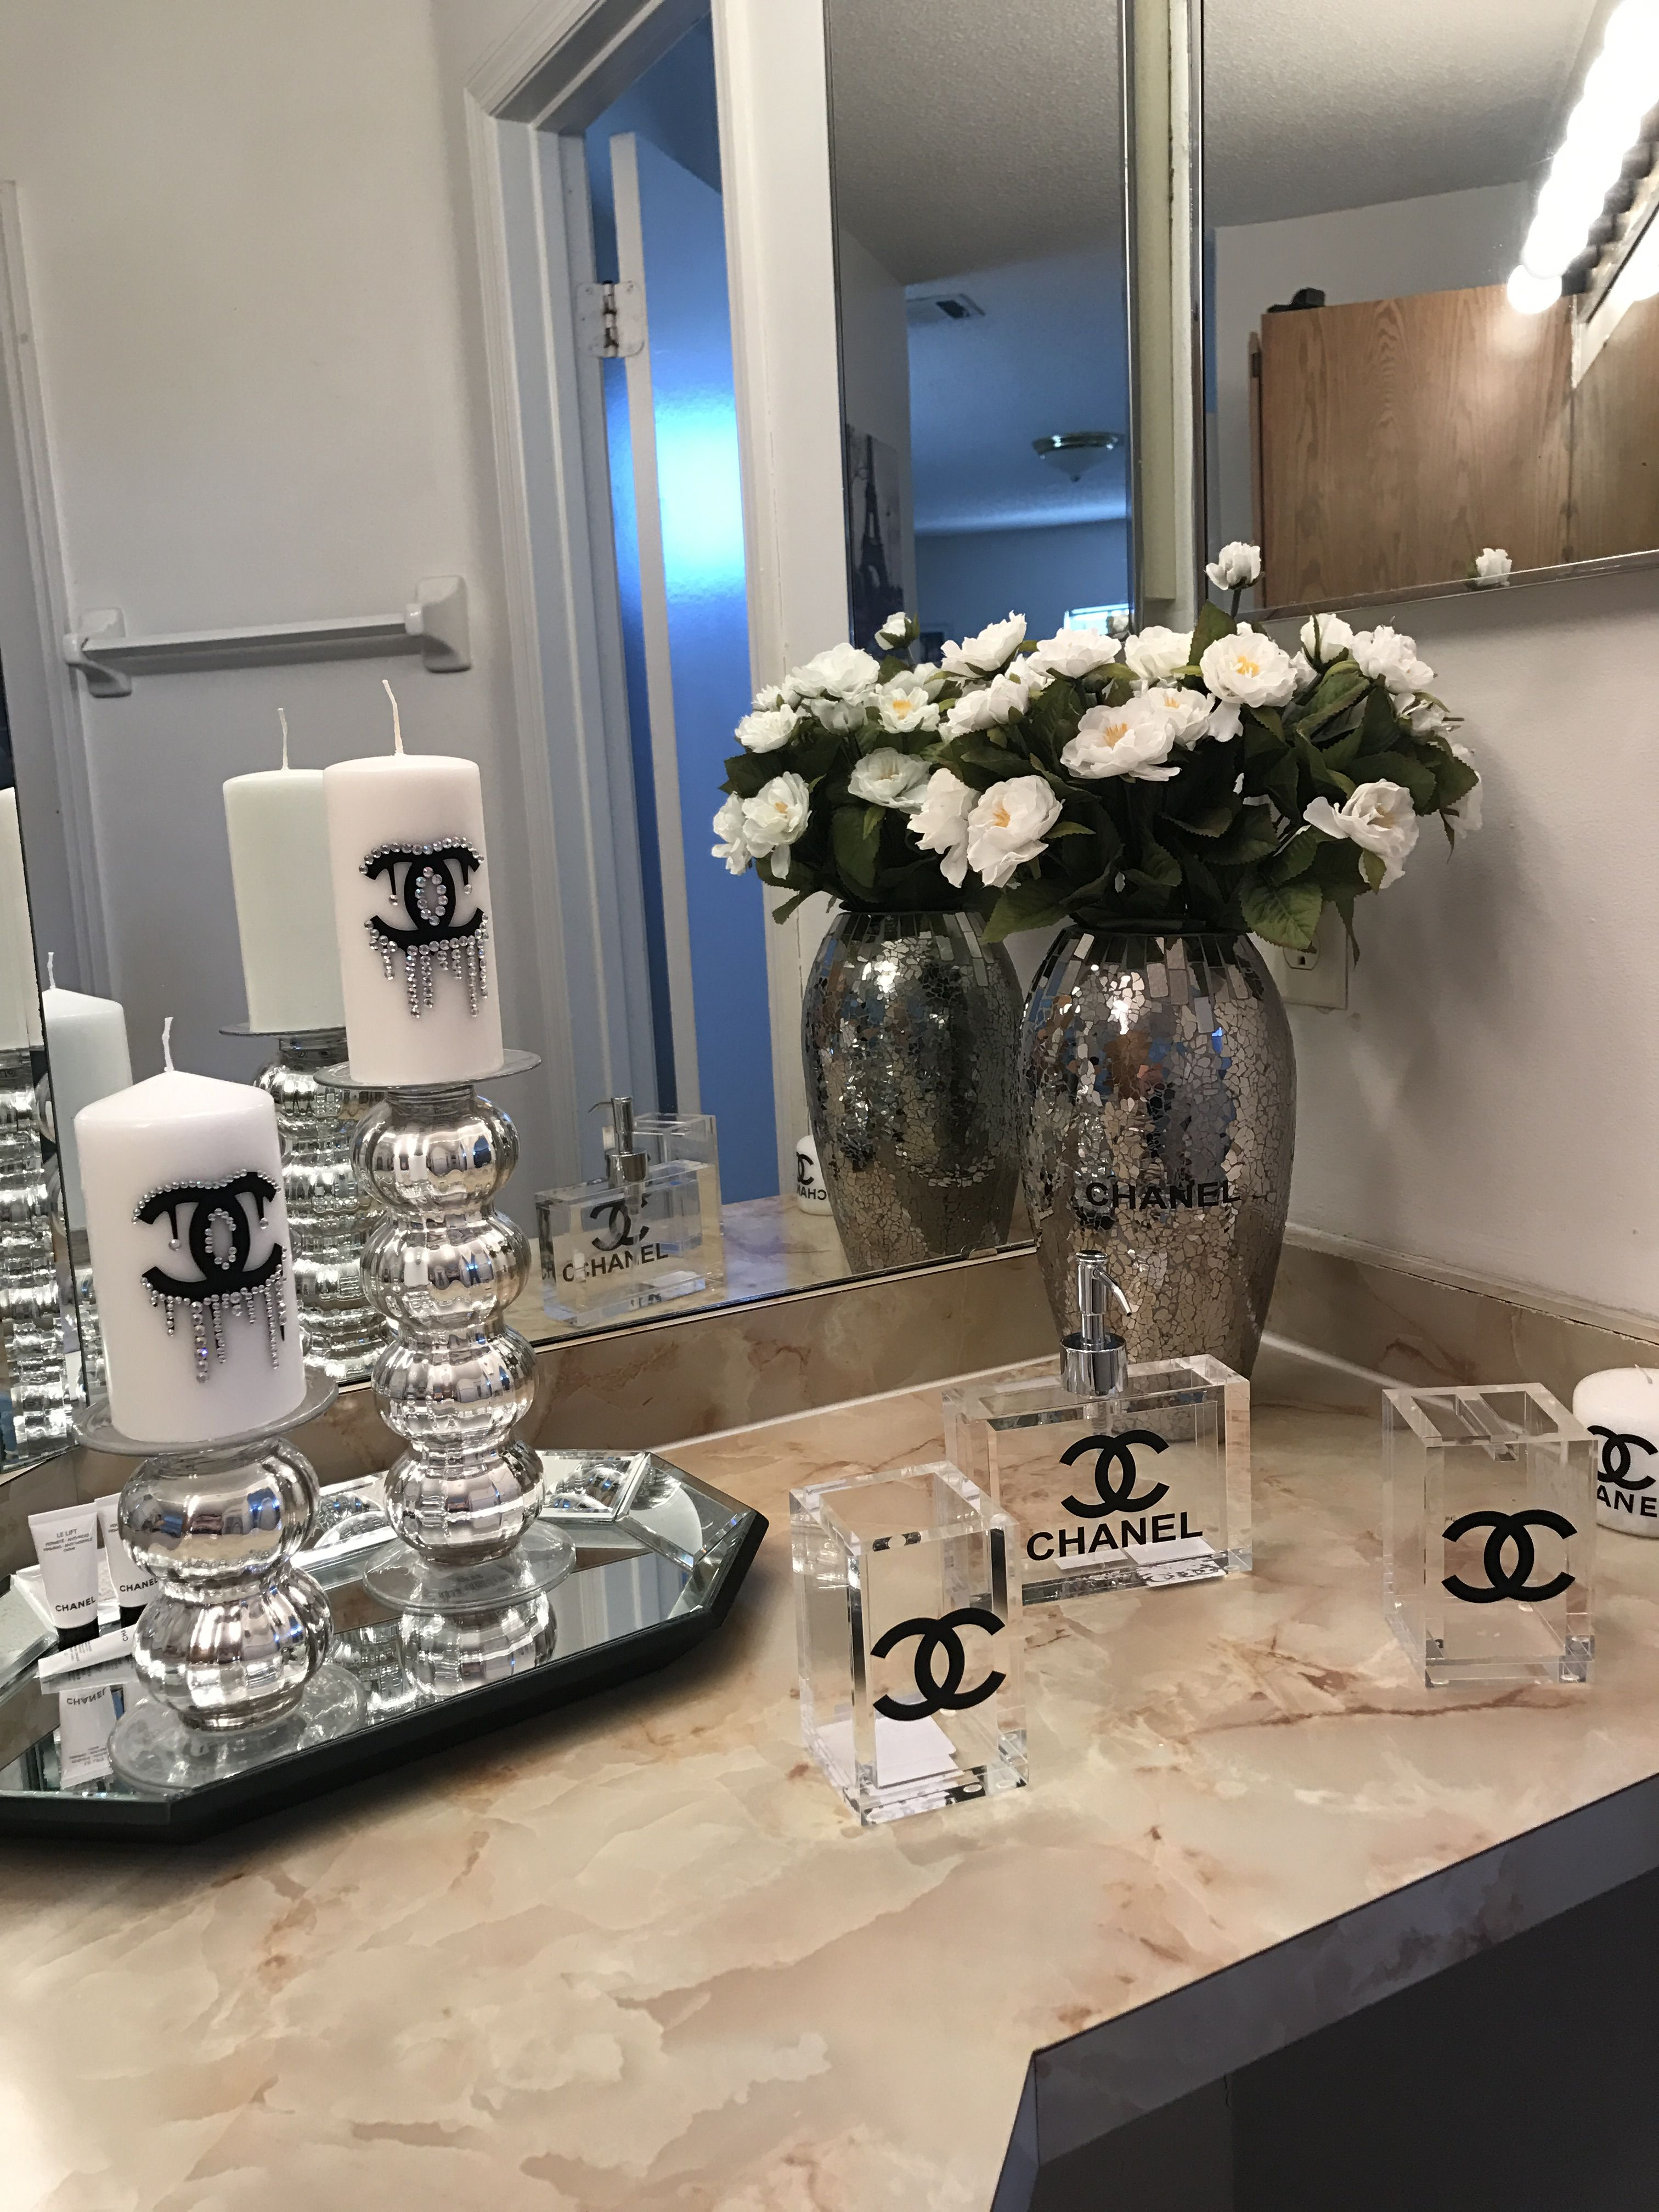 Chanel Decor Chanel Decor Chanel Inspired Room Chanel Room